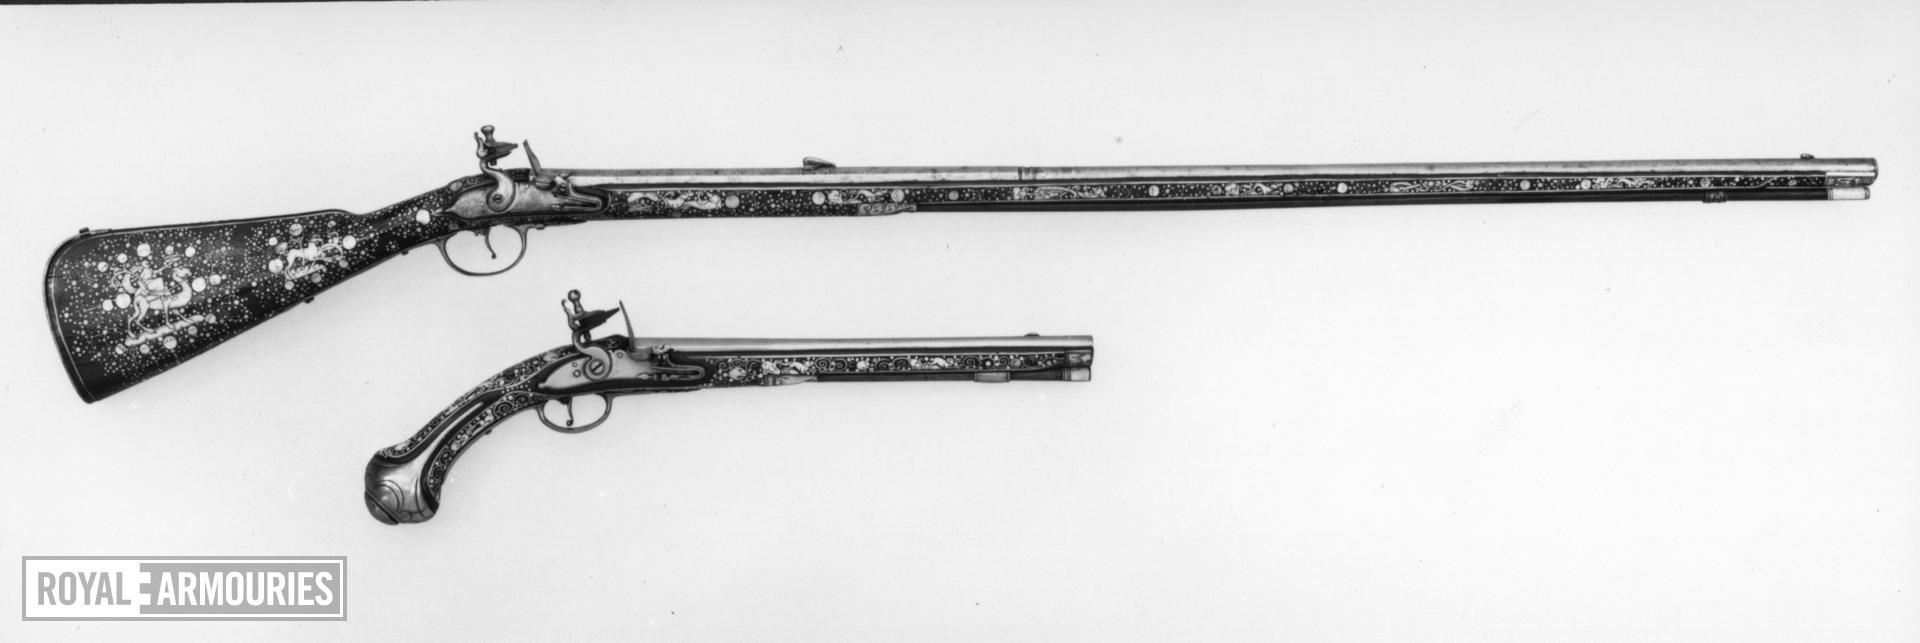 Flintlock muzzle-loading rifle - N/A